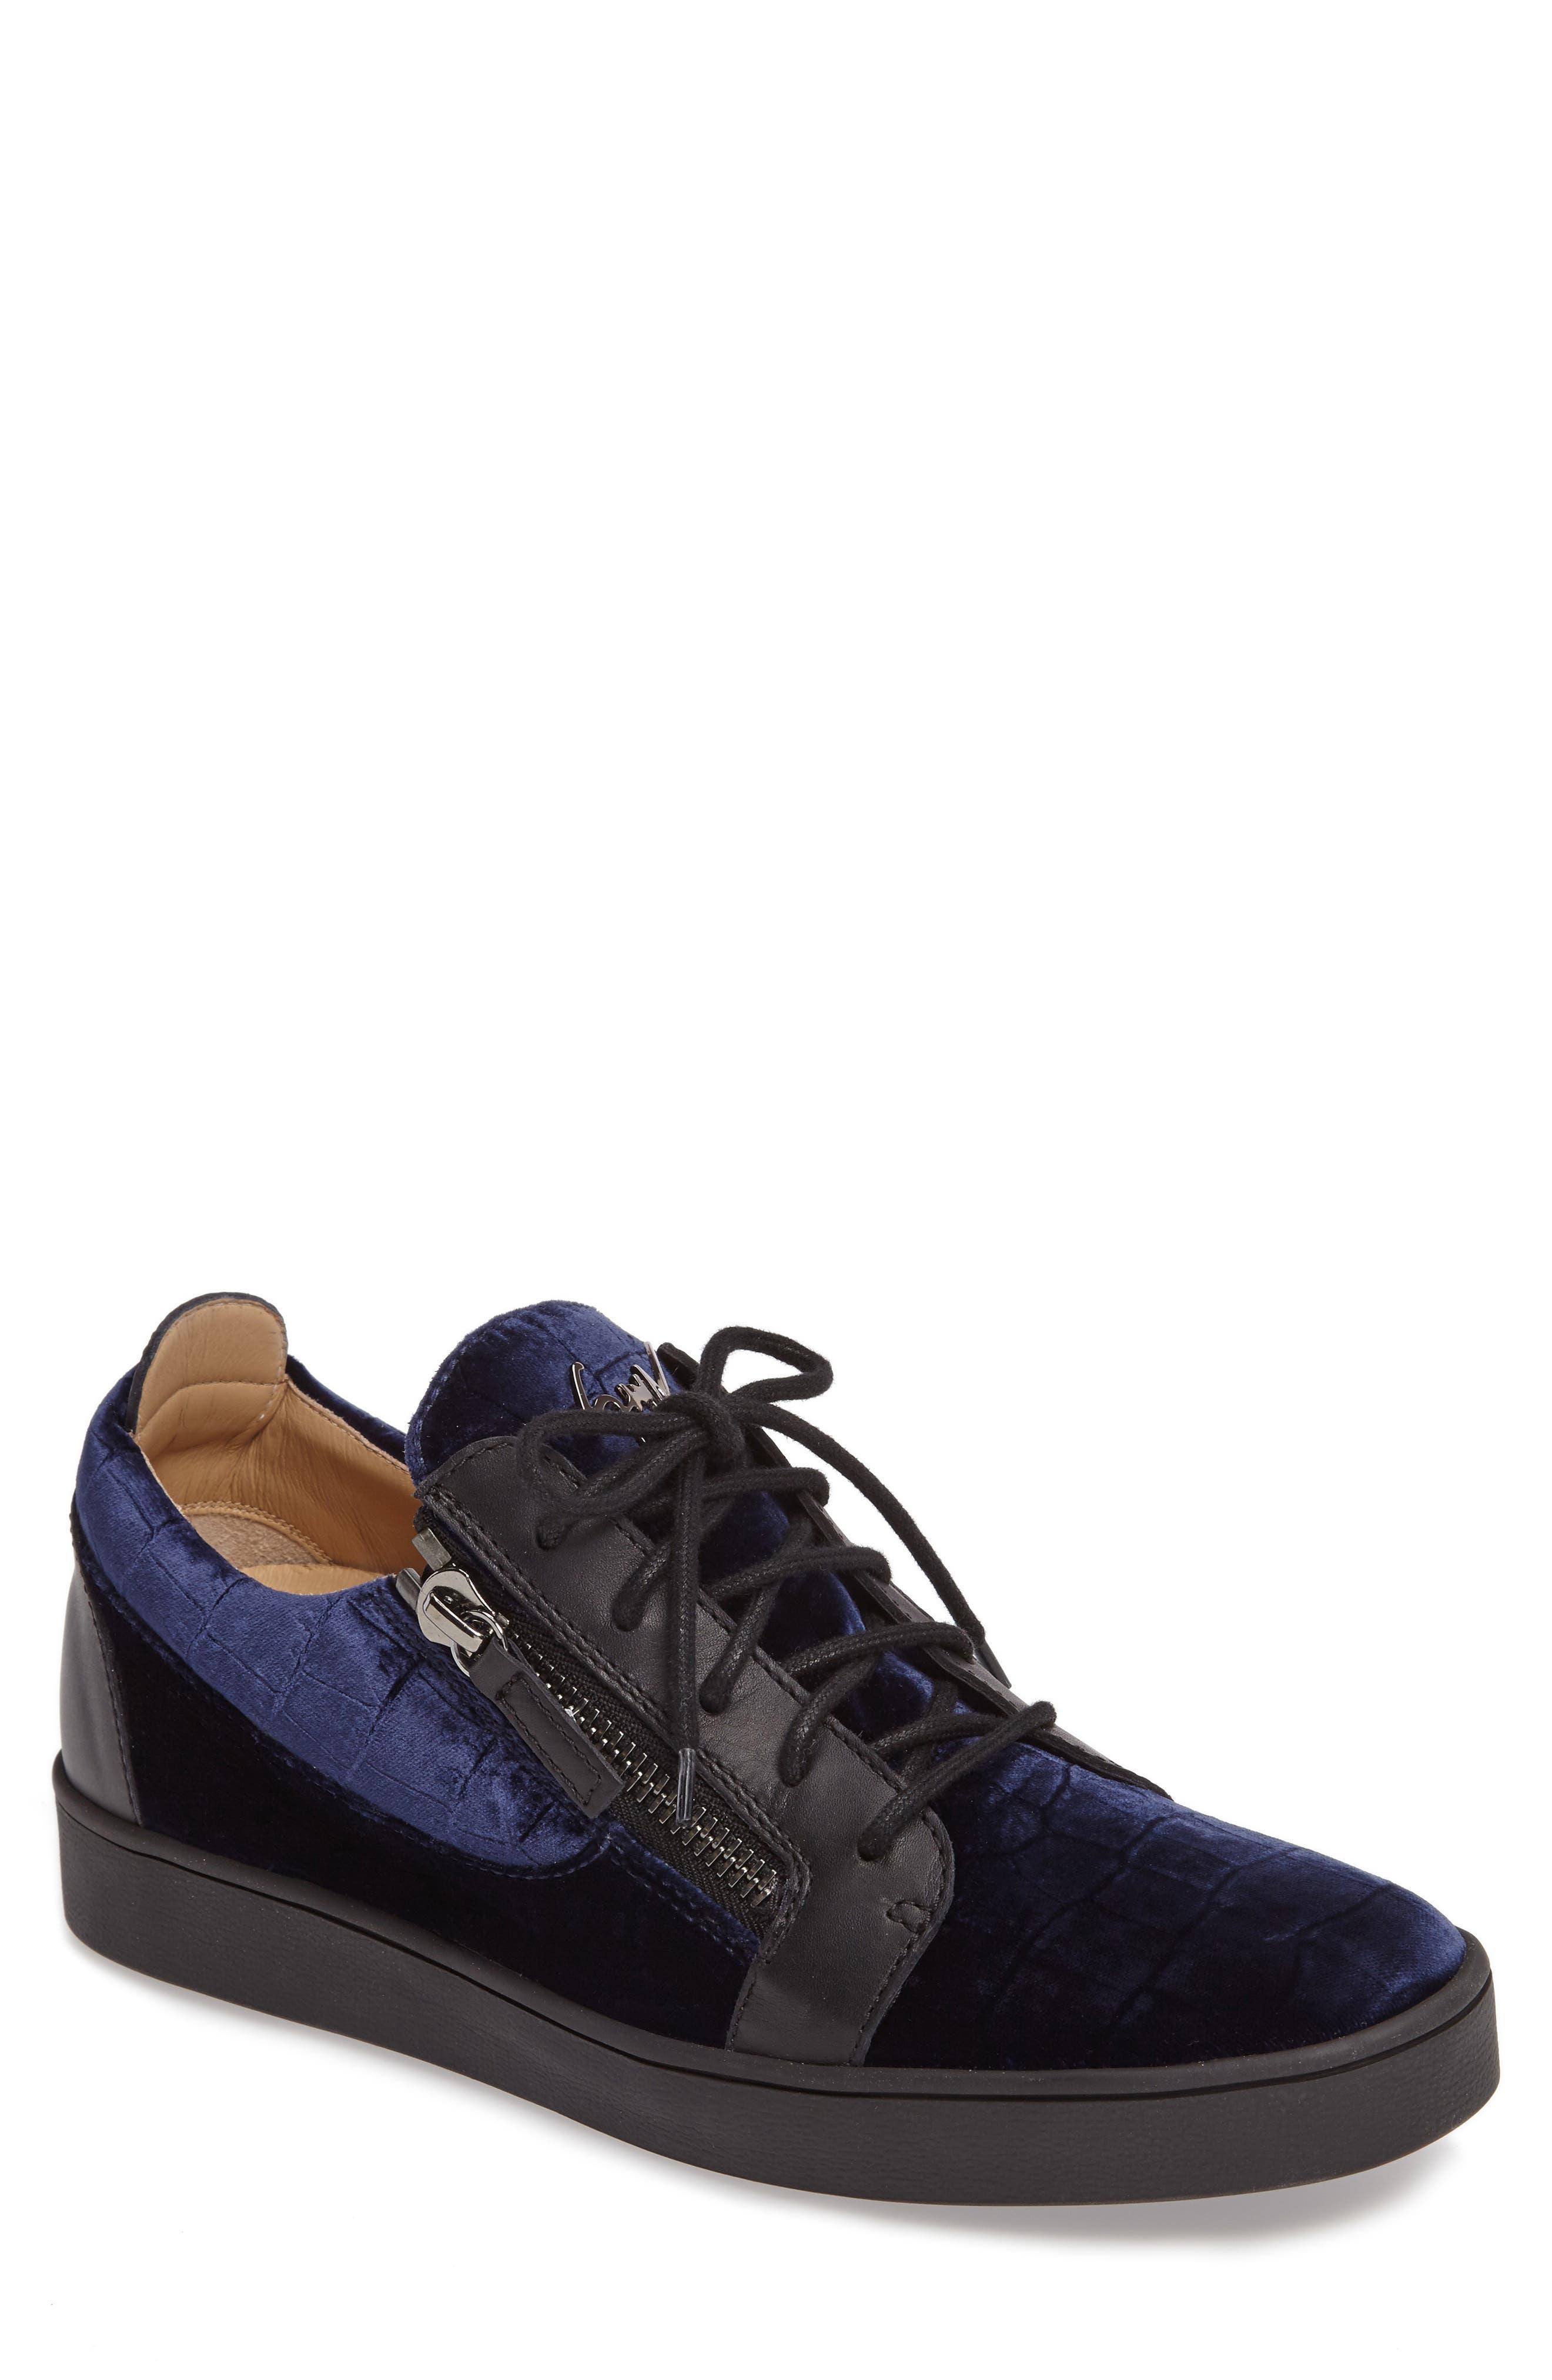 Low Top Sneaker,                             Main thumbnail 1, color,                             Navy